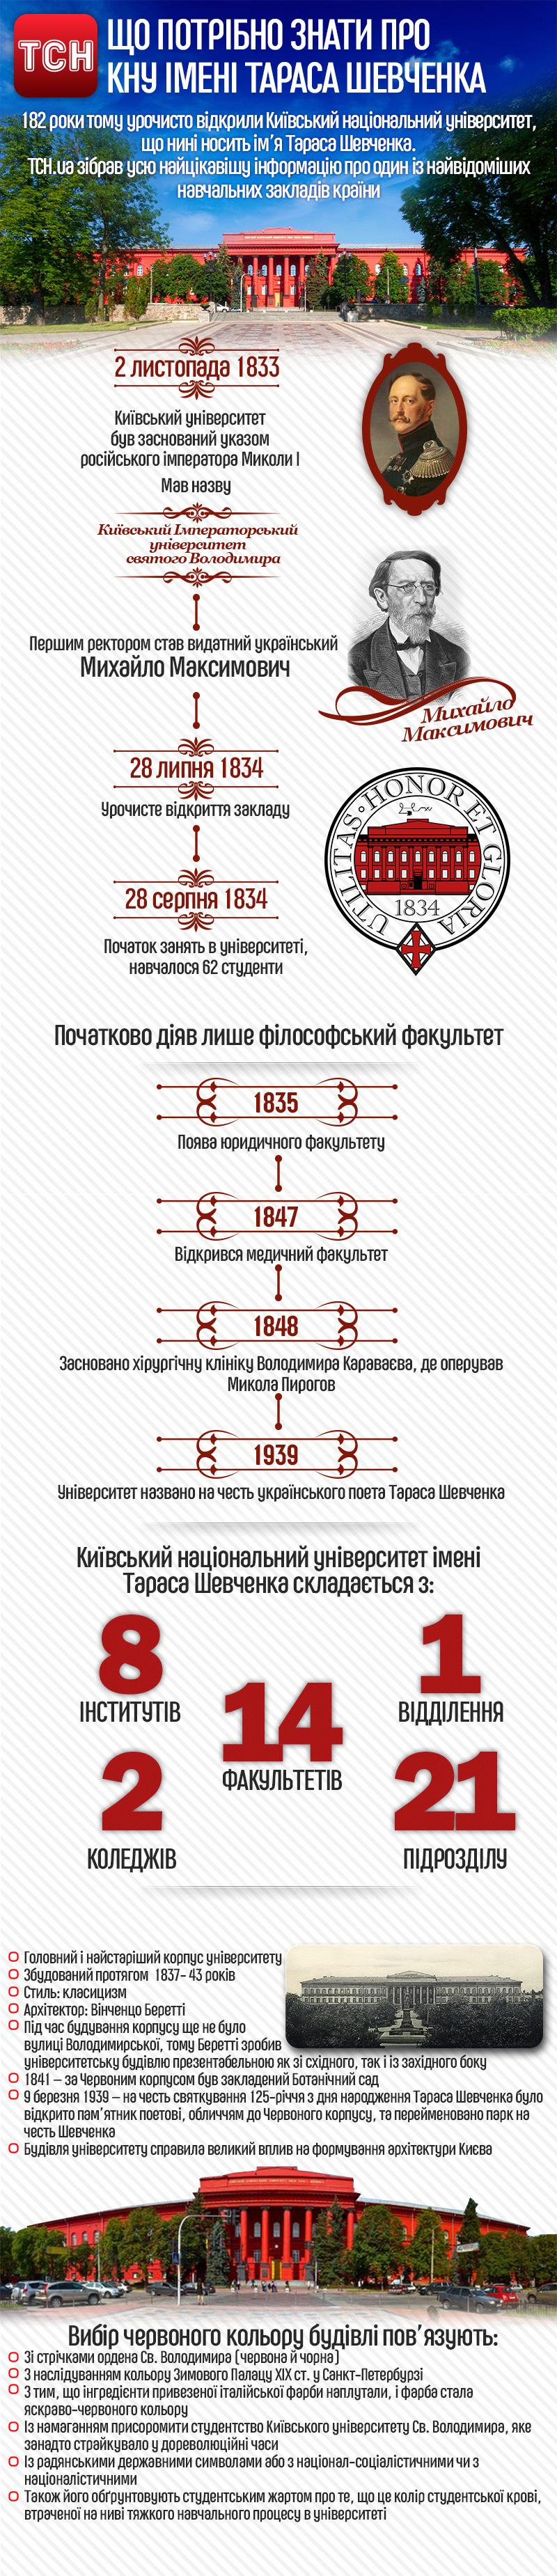 КНУ ім. Шевченка